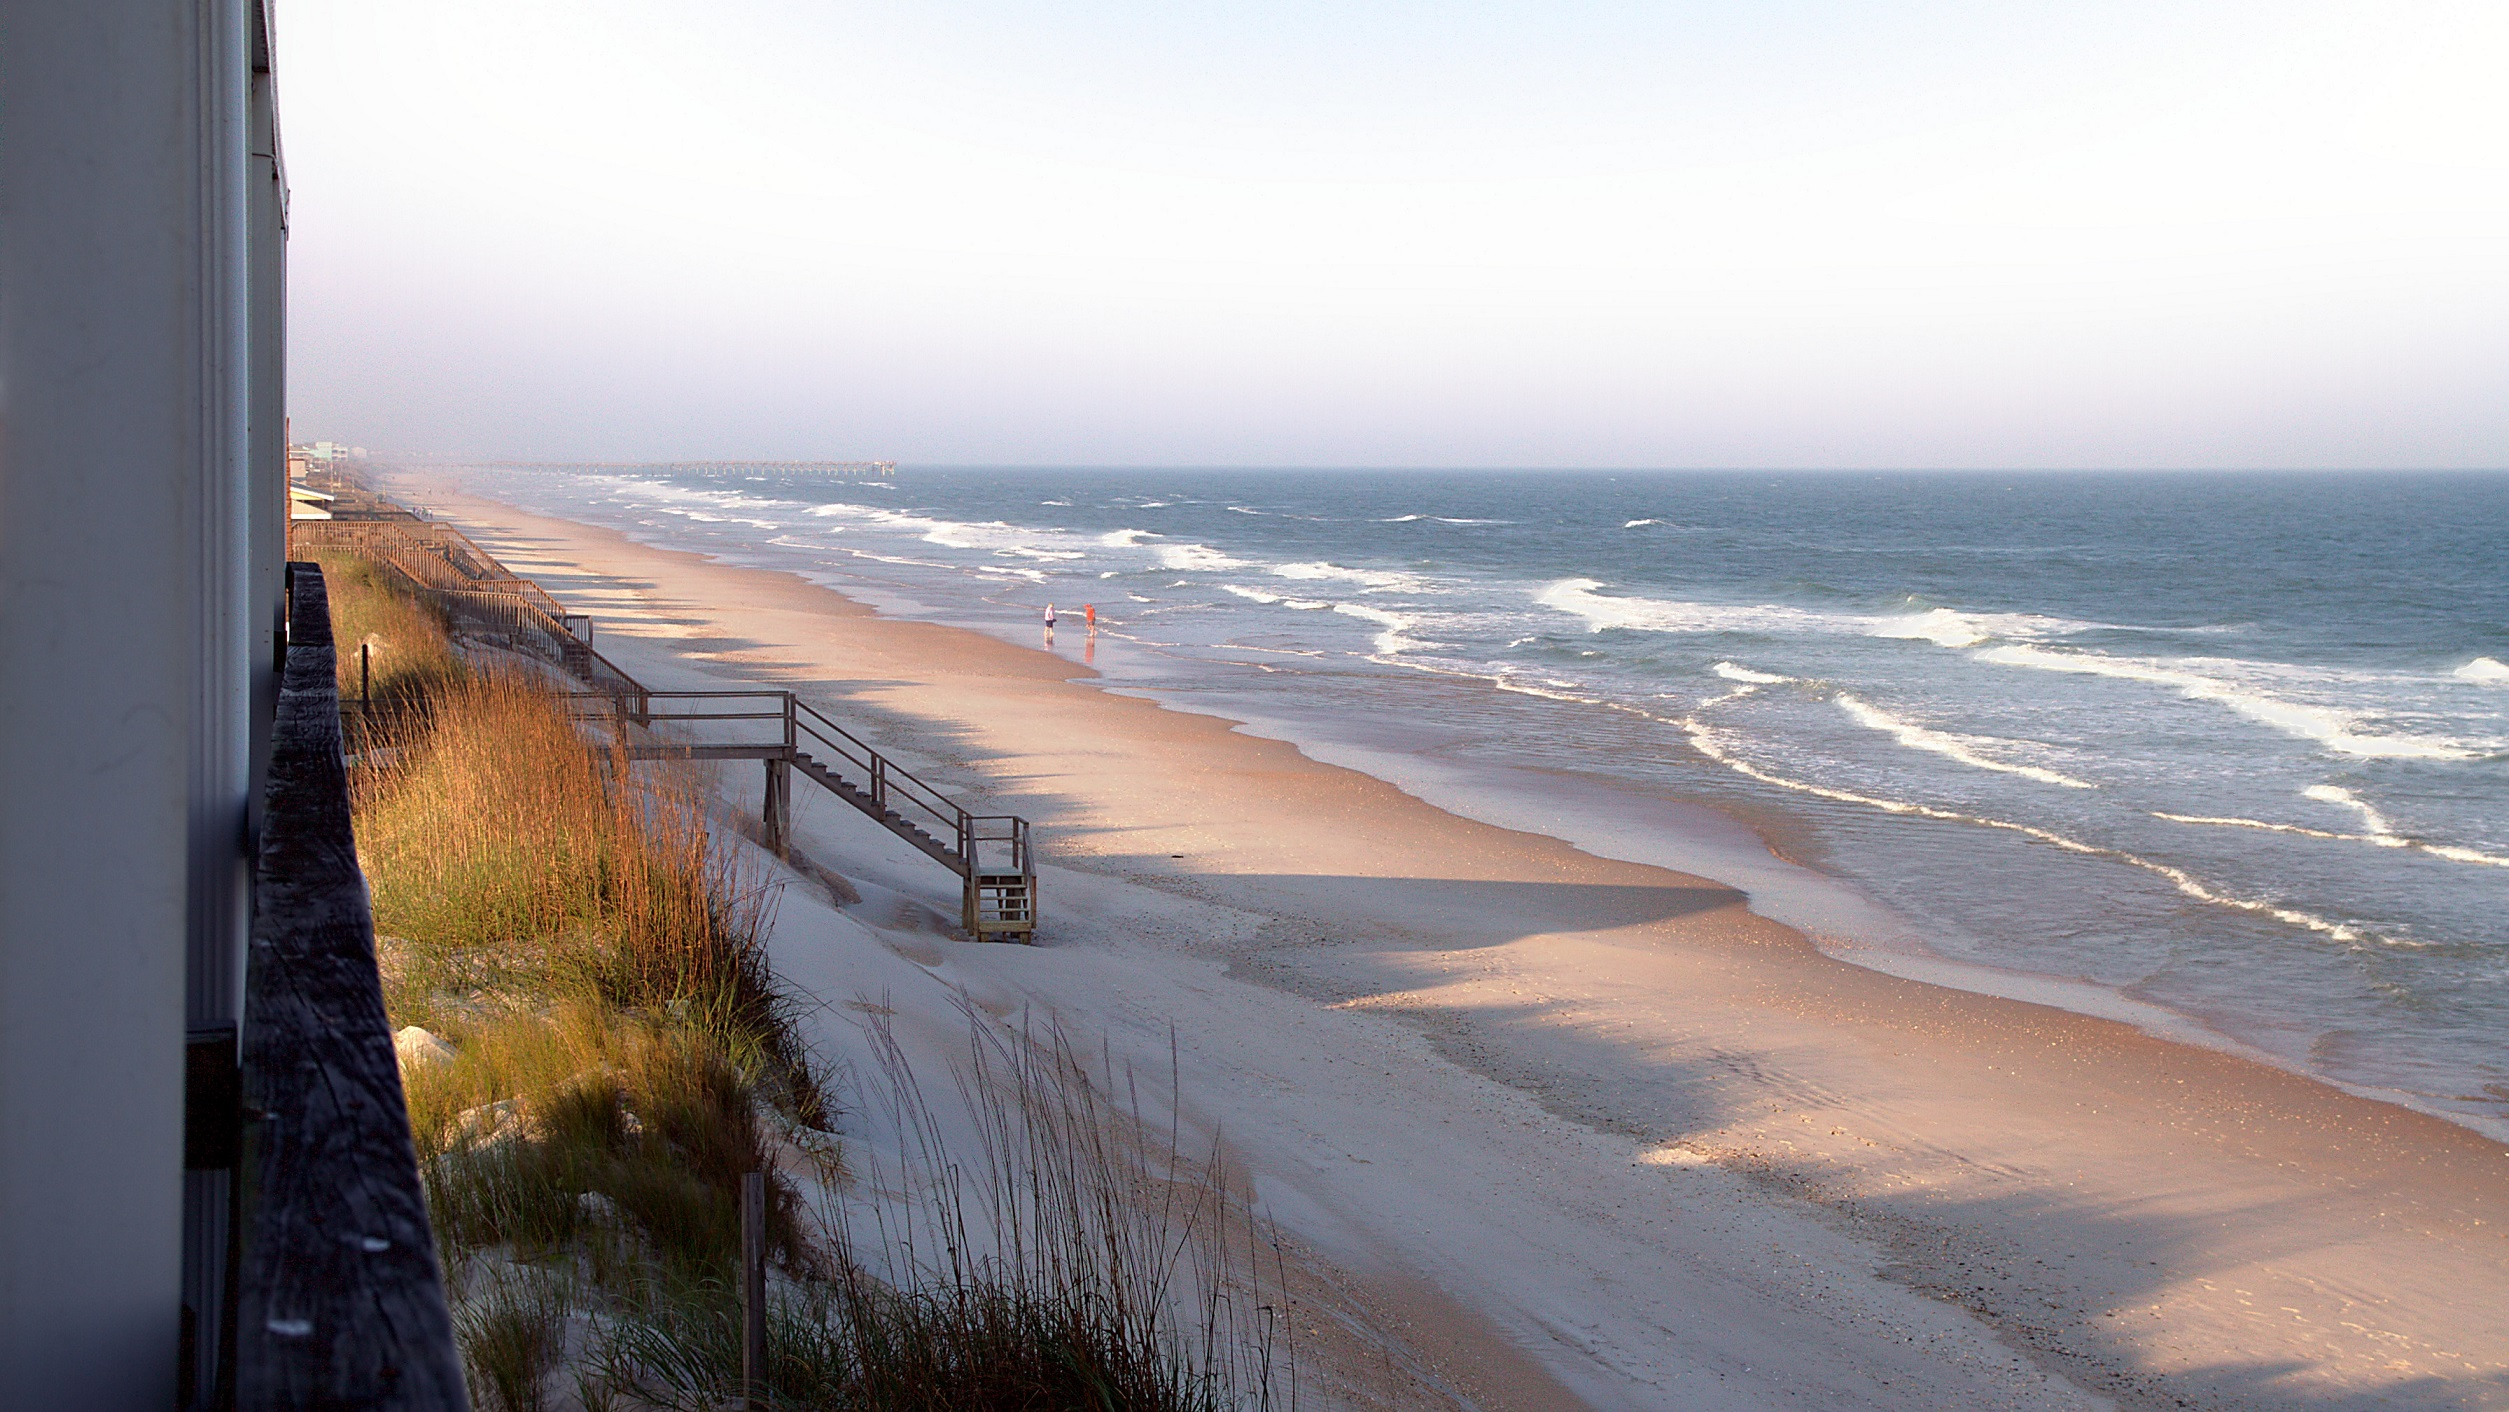 Sullivan S Island Beach The Best Beaches In World